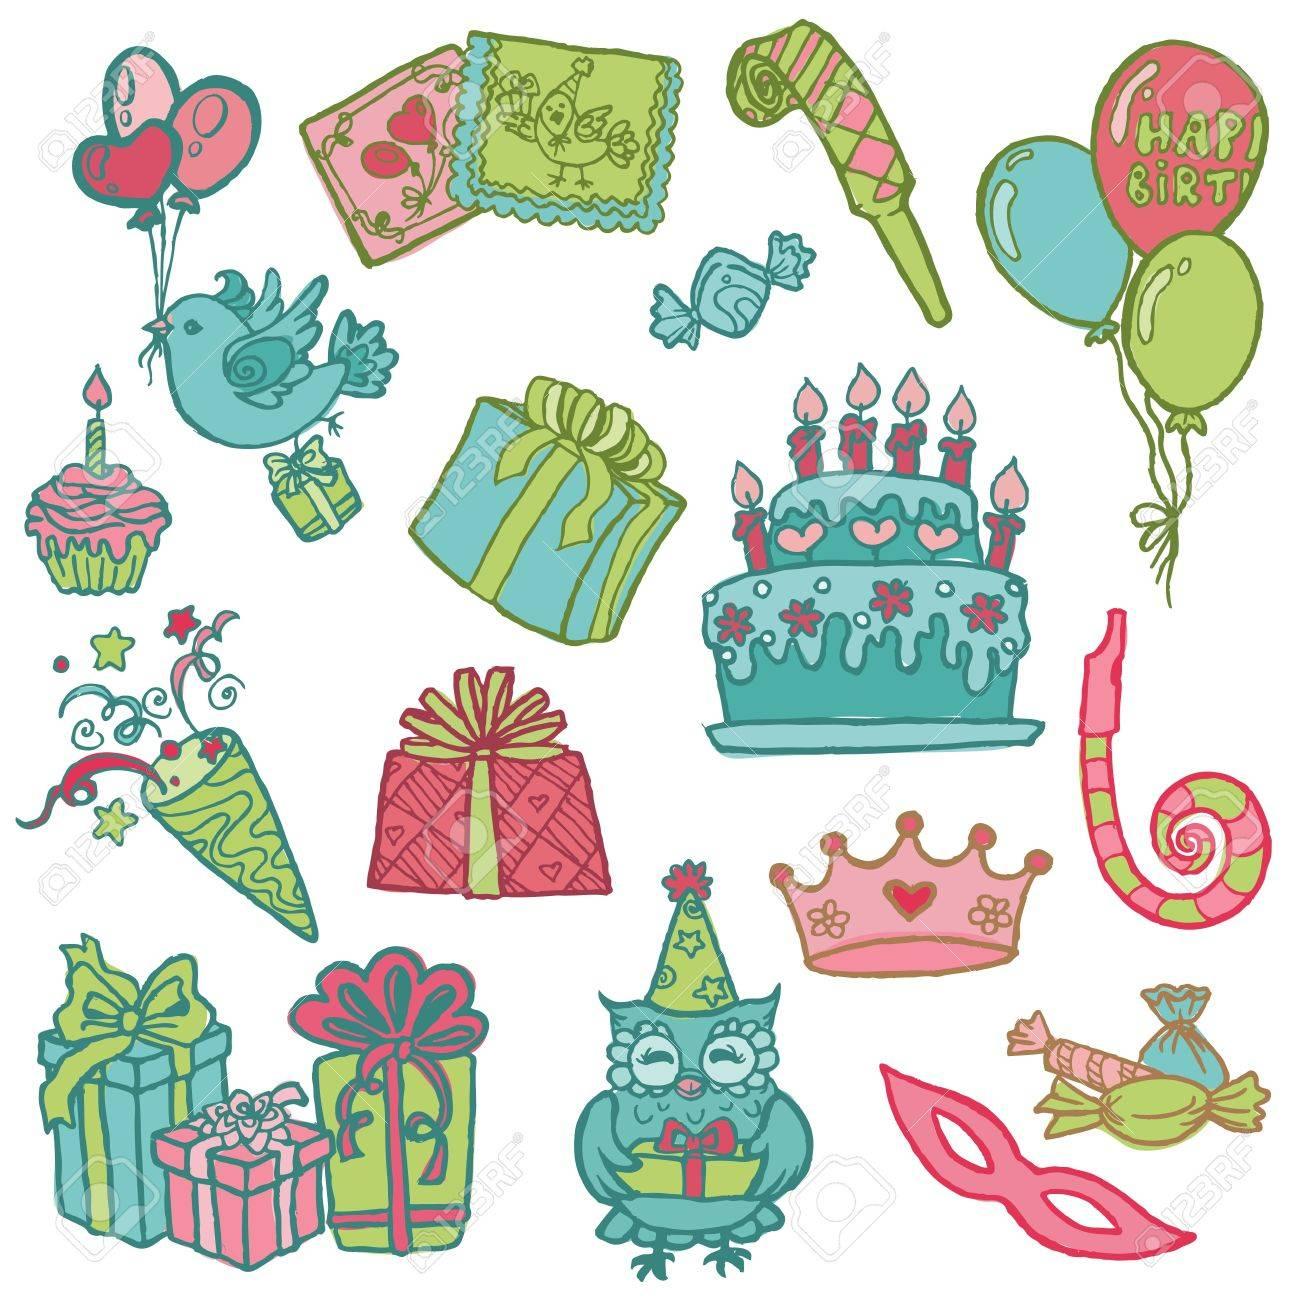 Hand drawn Birthday Celebration Design Elements - for Scrapbook, Invitation in vector Stock Vector - 12482354